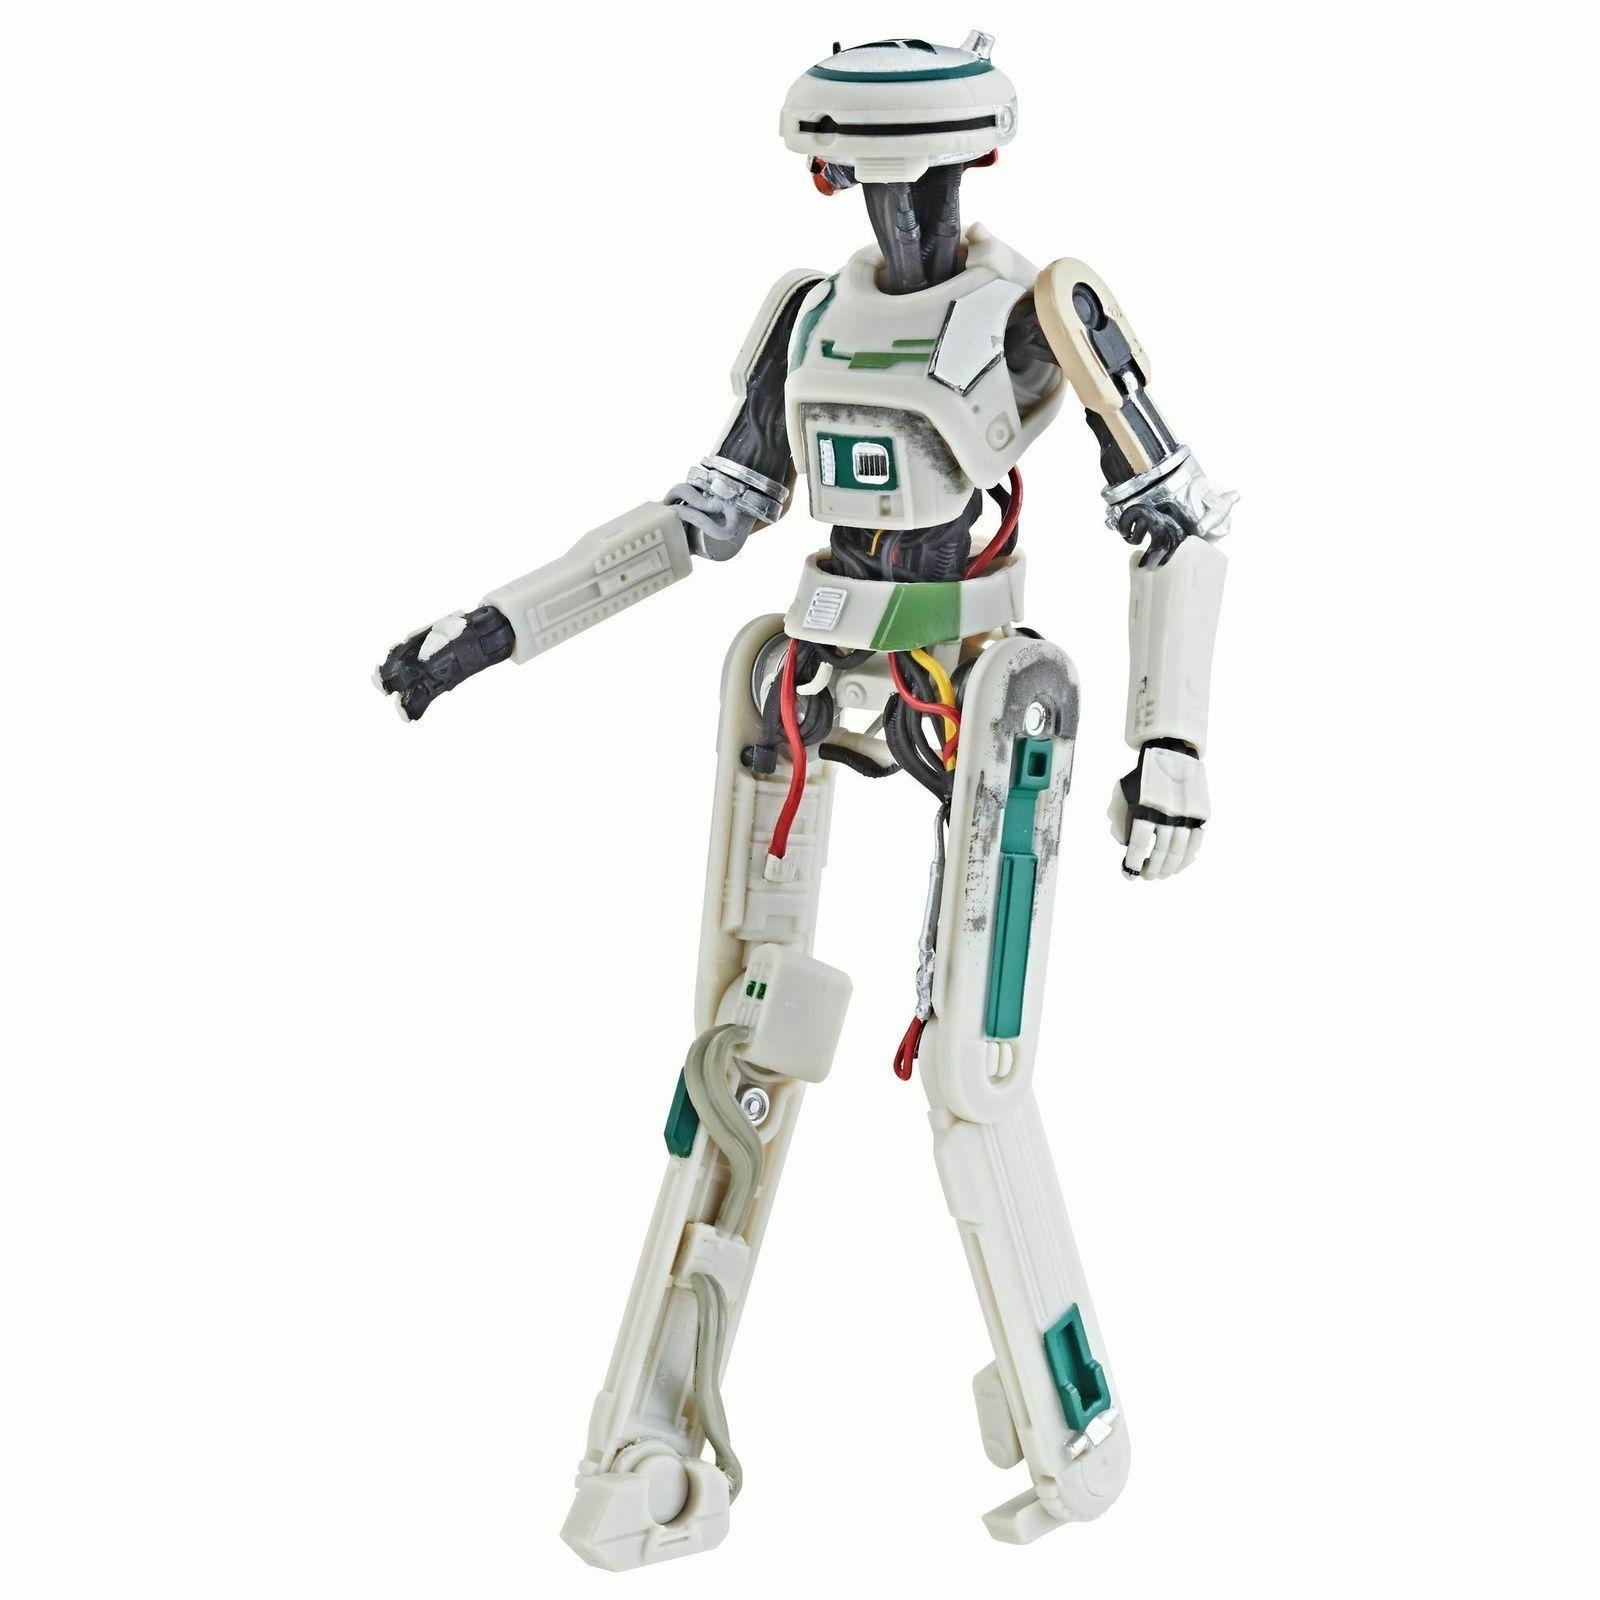 "Star Wars Series 6"" Figure"